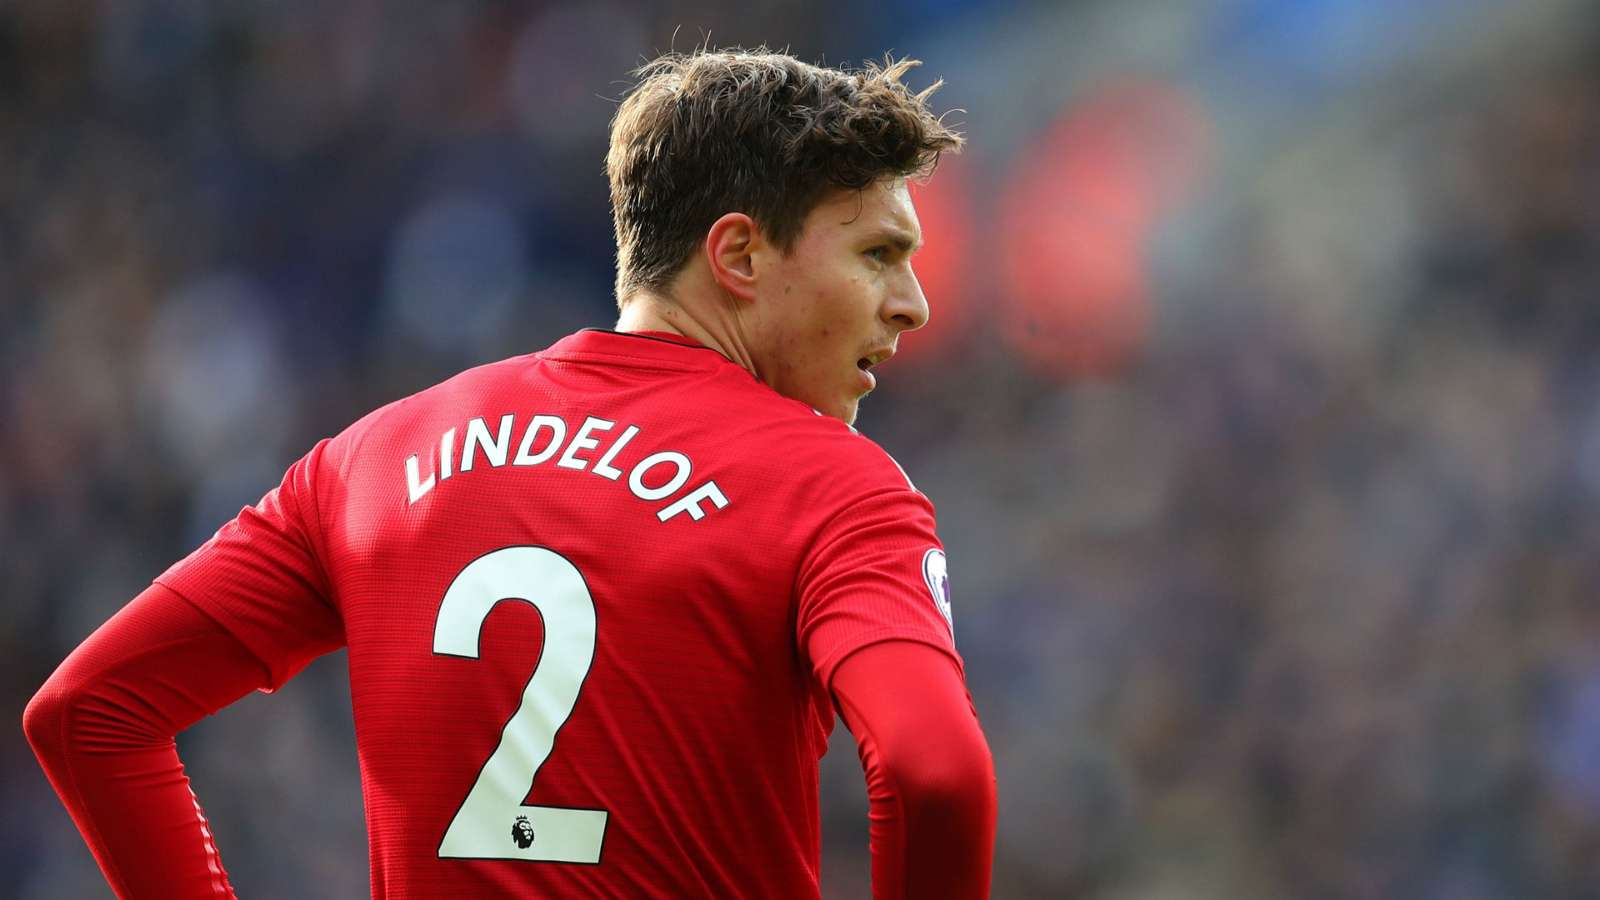 منچستریونایتد-لیگ برتر-سوئد-شیاطین سرخ-Sweden-Premier League-Manchester United-England